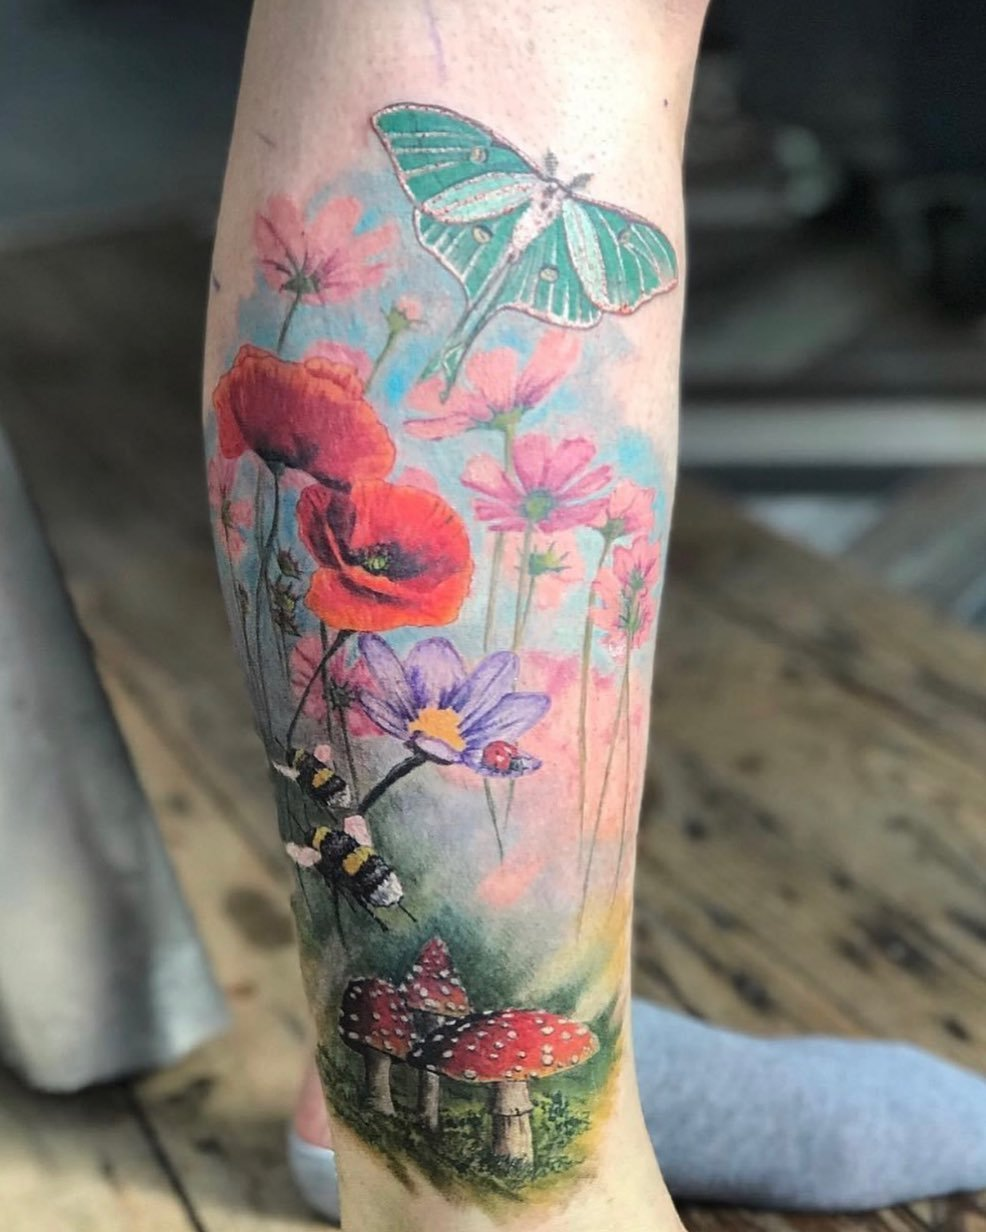 14 Nature Scenery Flowers and Luna Moth Tattoo